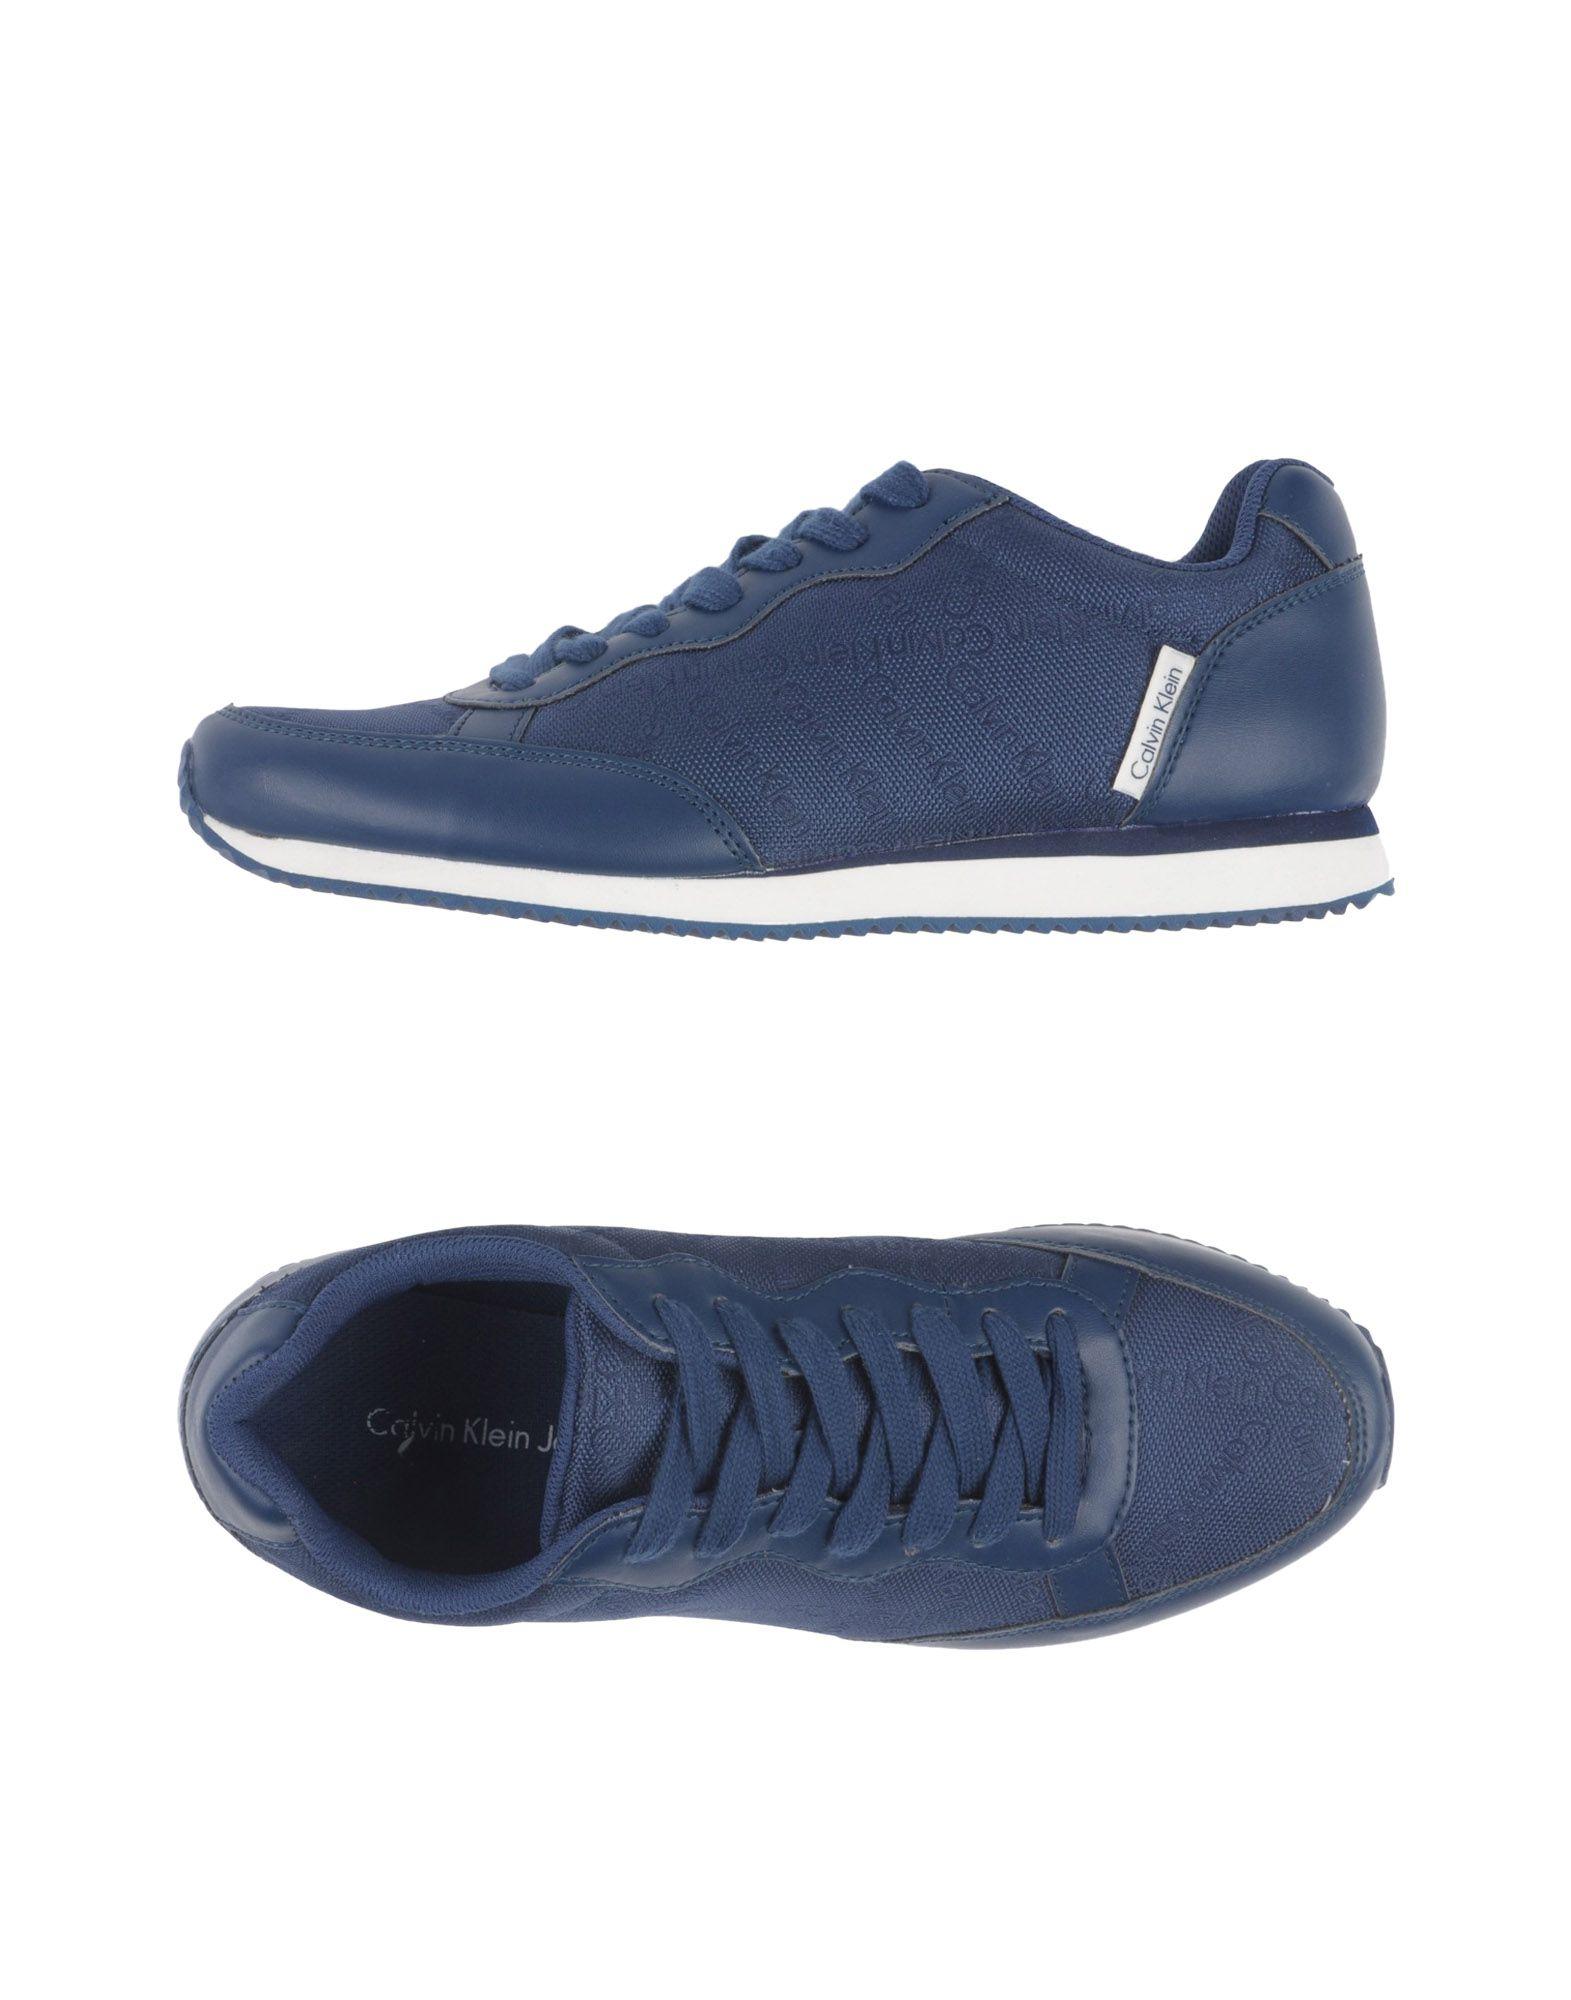 Sneakers Calvin Klein Jeans Donna - 11392753VX